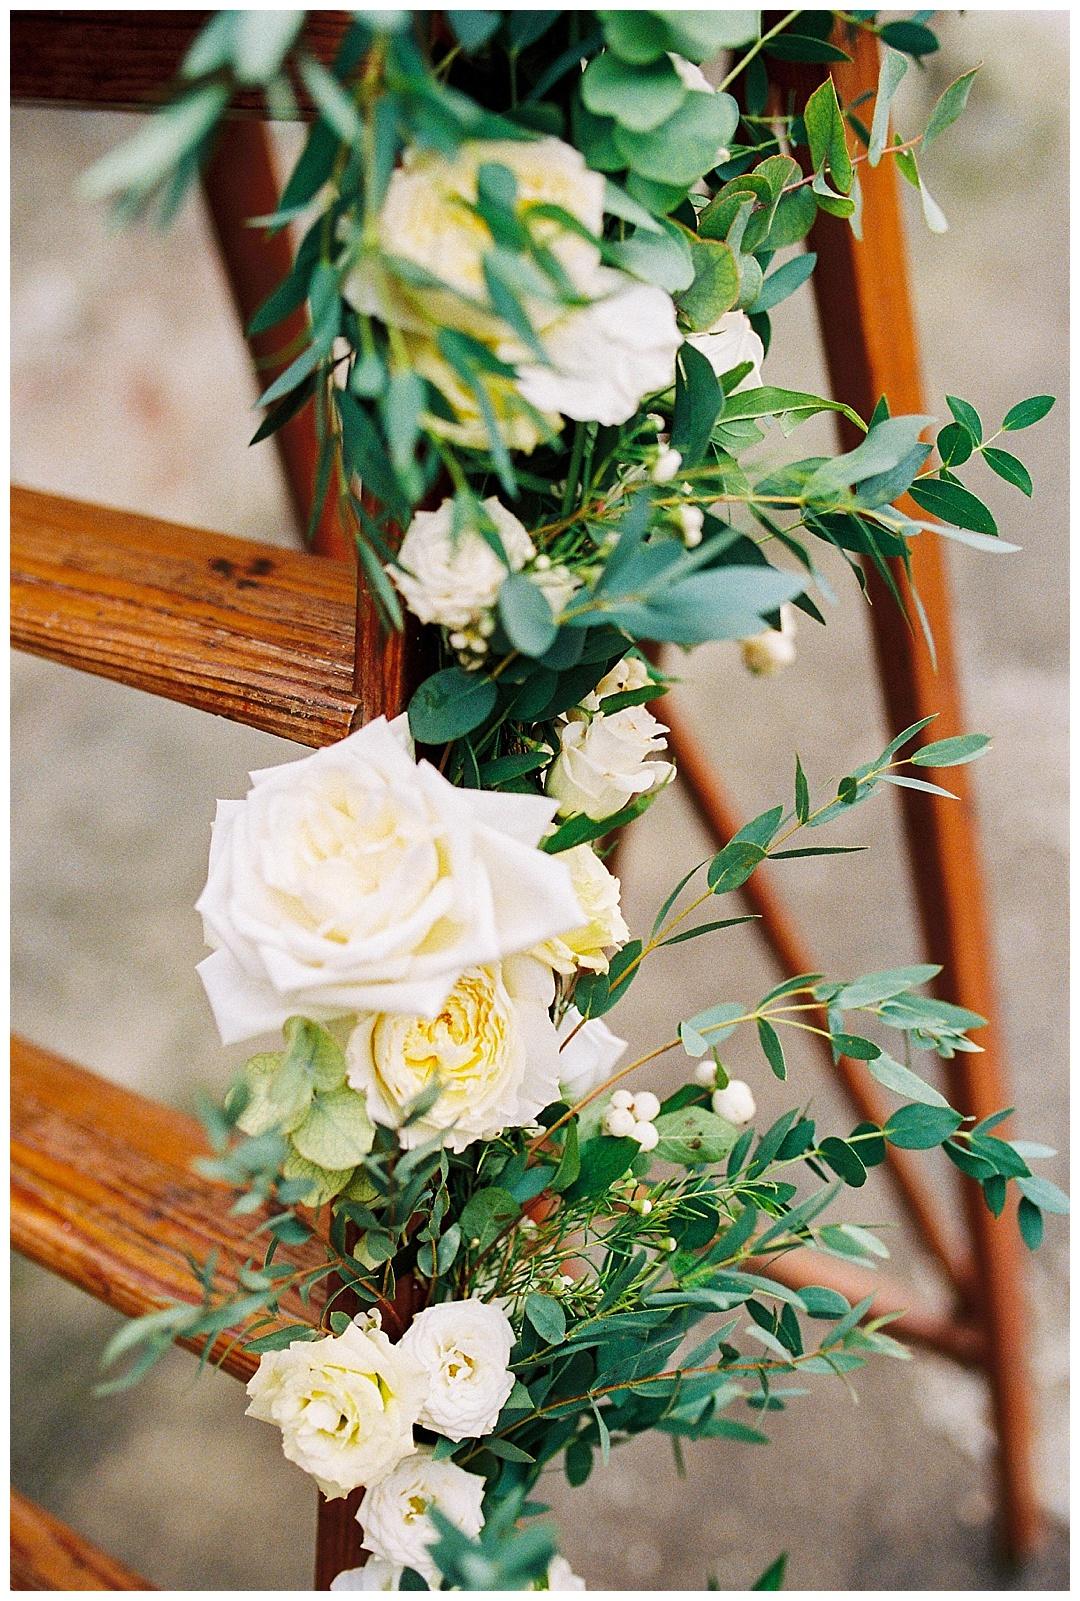 We_Can _Be_Heroes_alternative_wedding_photographer_Tuscany_wedding_film_0004